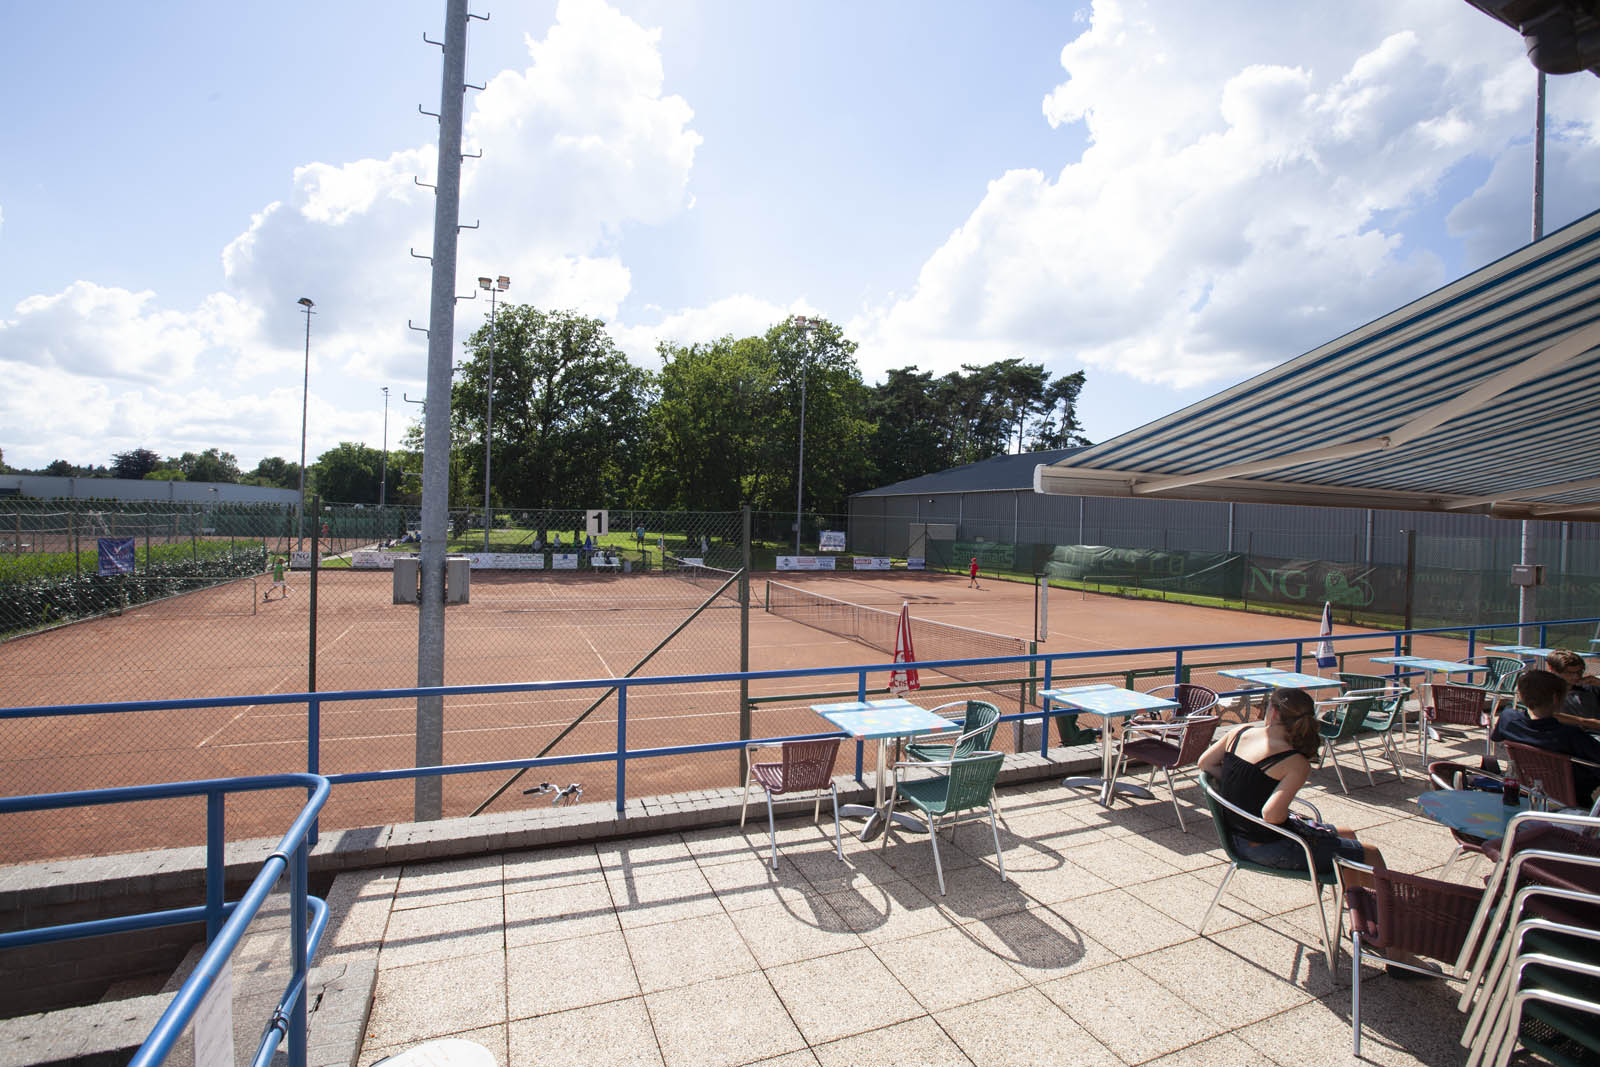 20120706_tennis_0016